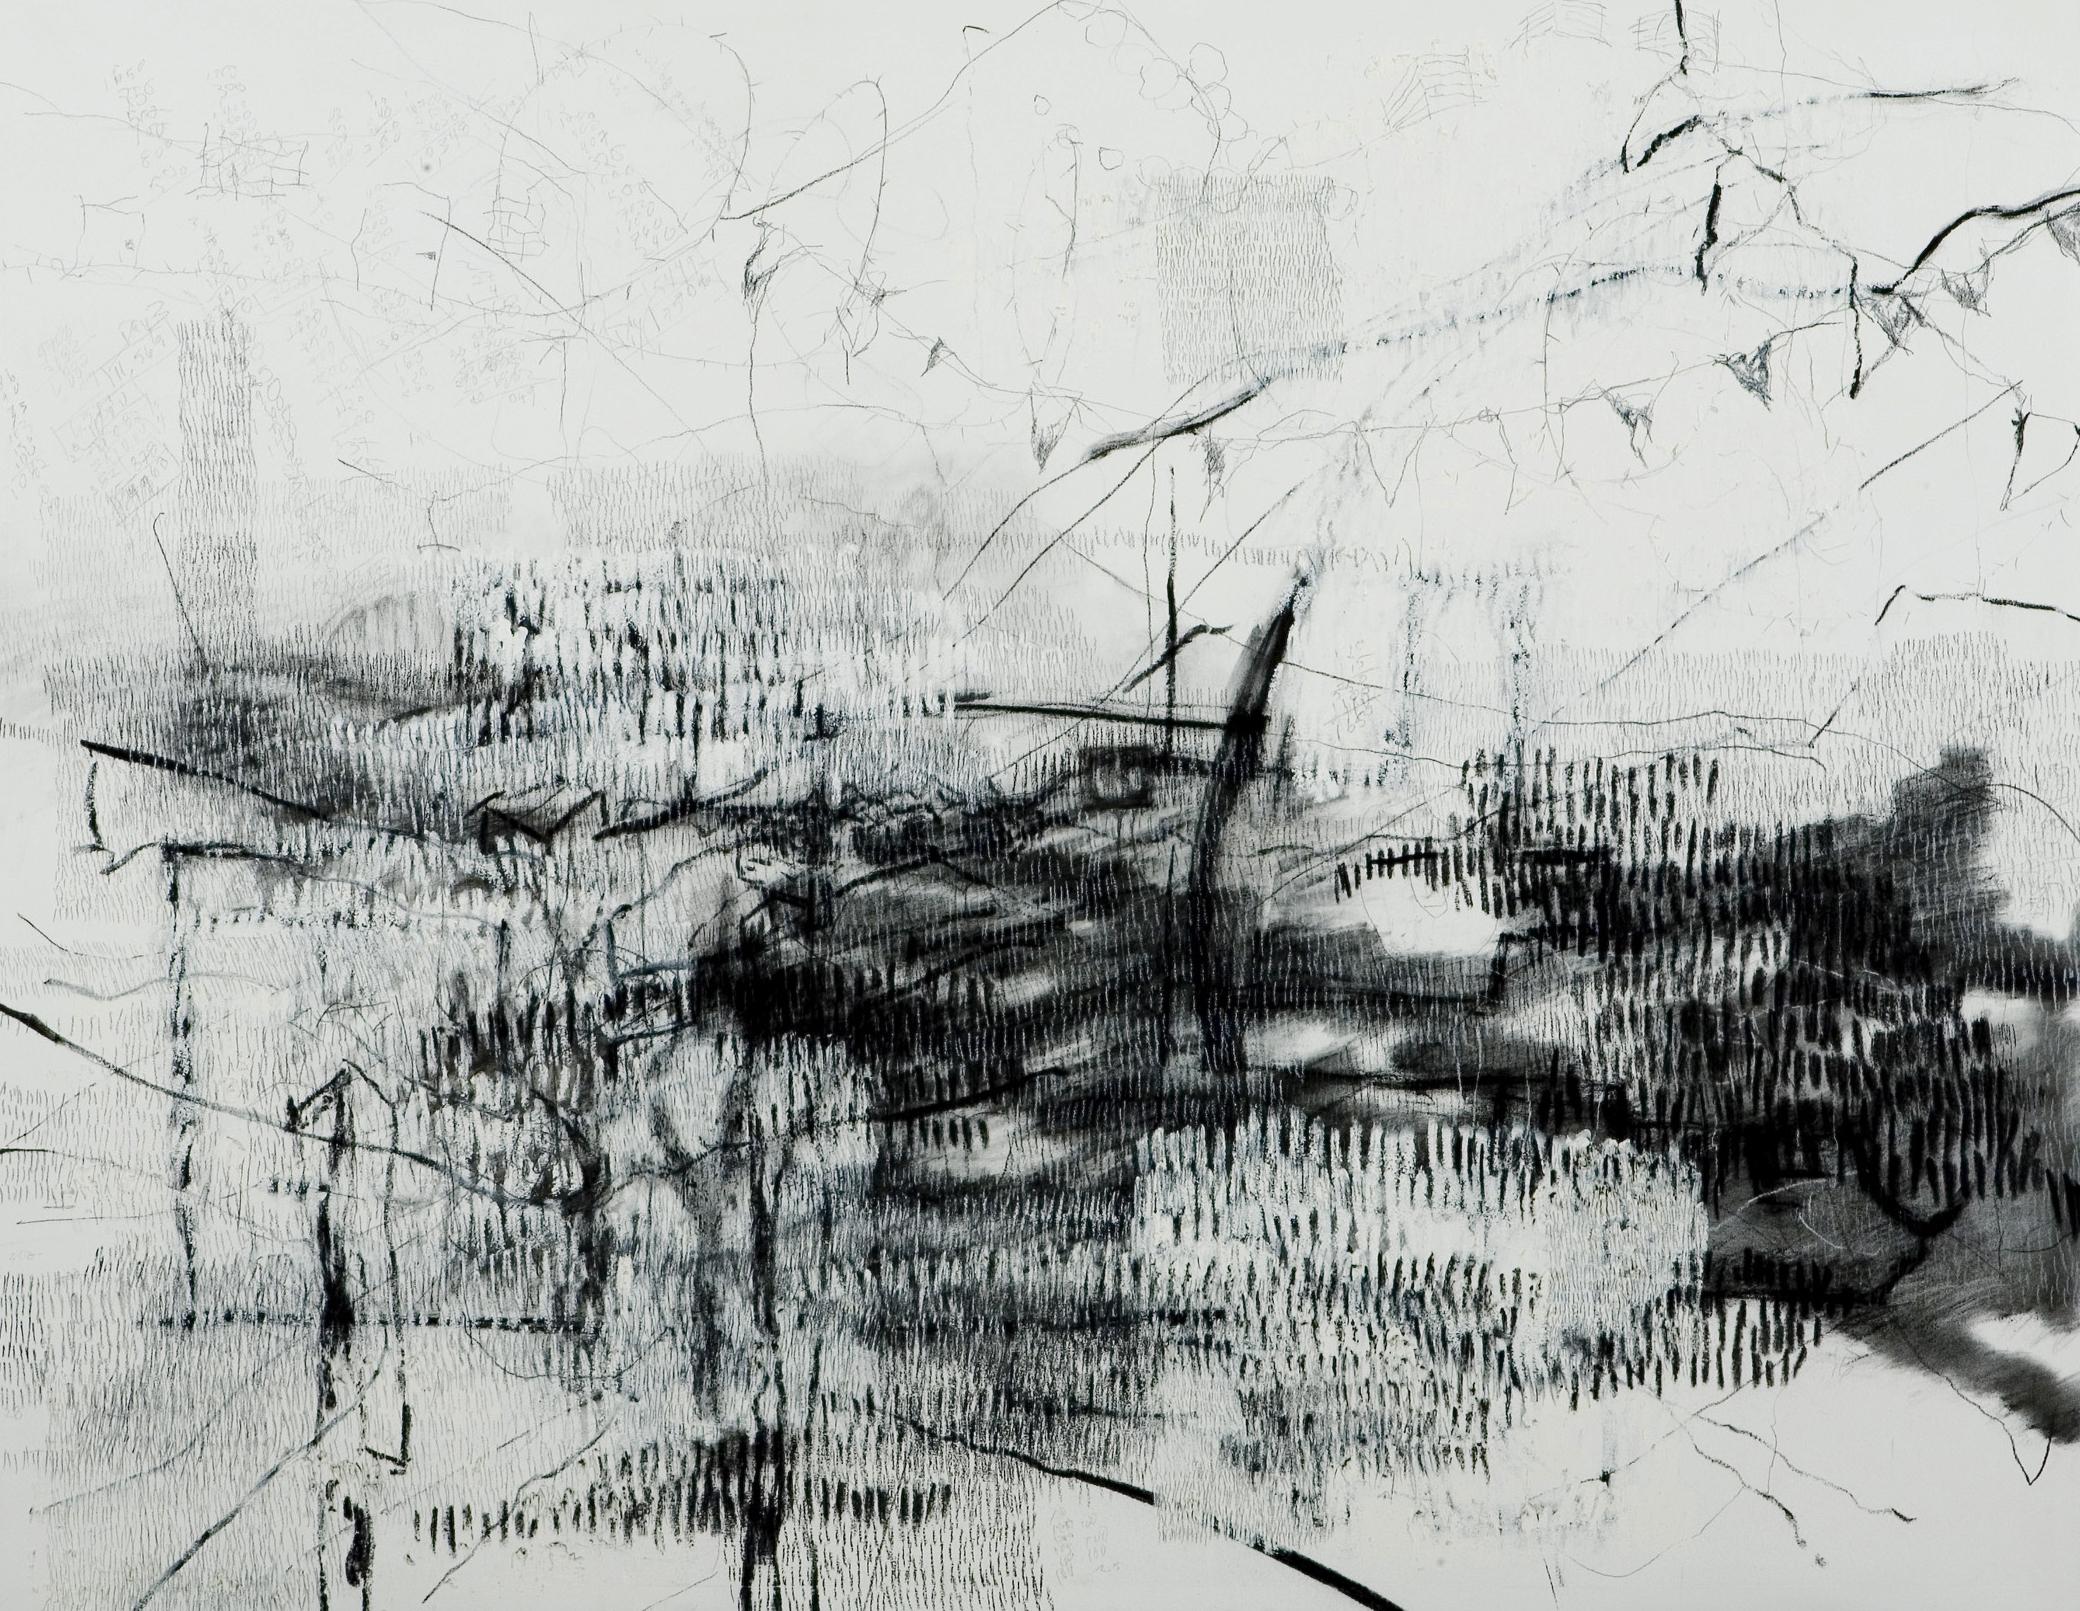 "23,046 Steps to Tania (Phoenix)  Graphite, charcoal, conte, oil stick, 42"" x 54"", 2007"